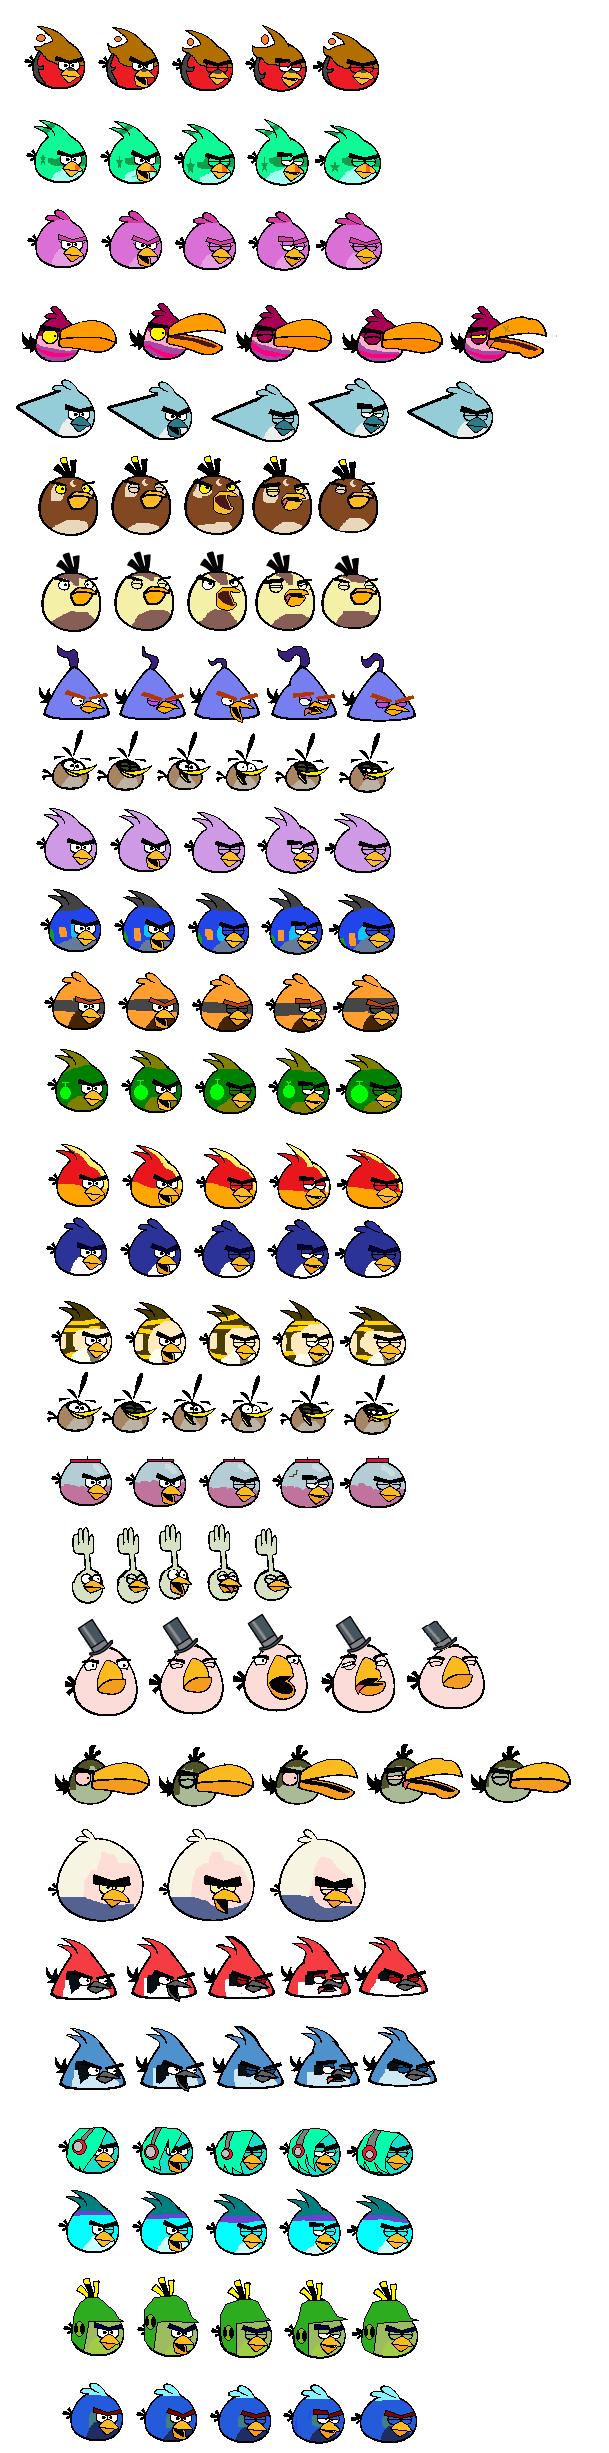 Angry Birds OCs Sprites (Update)